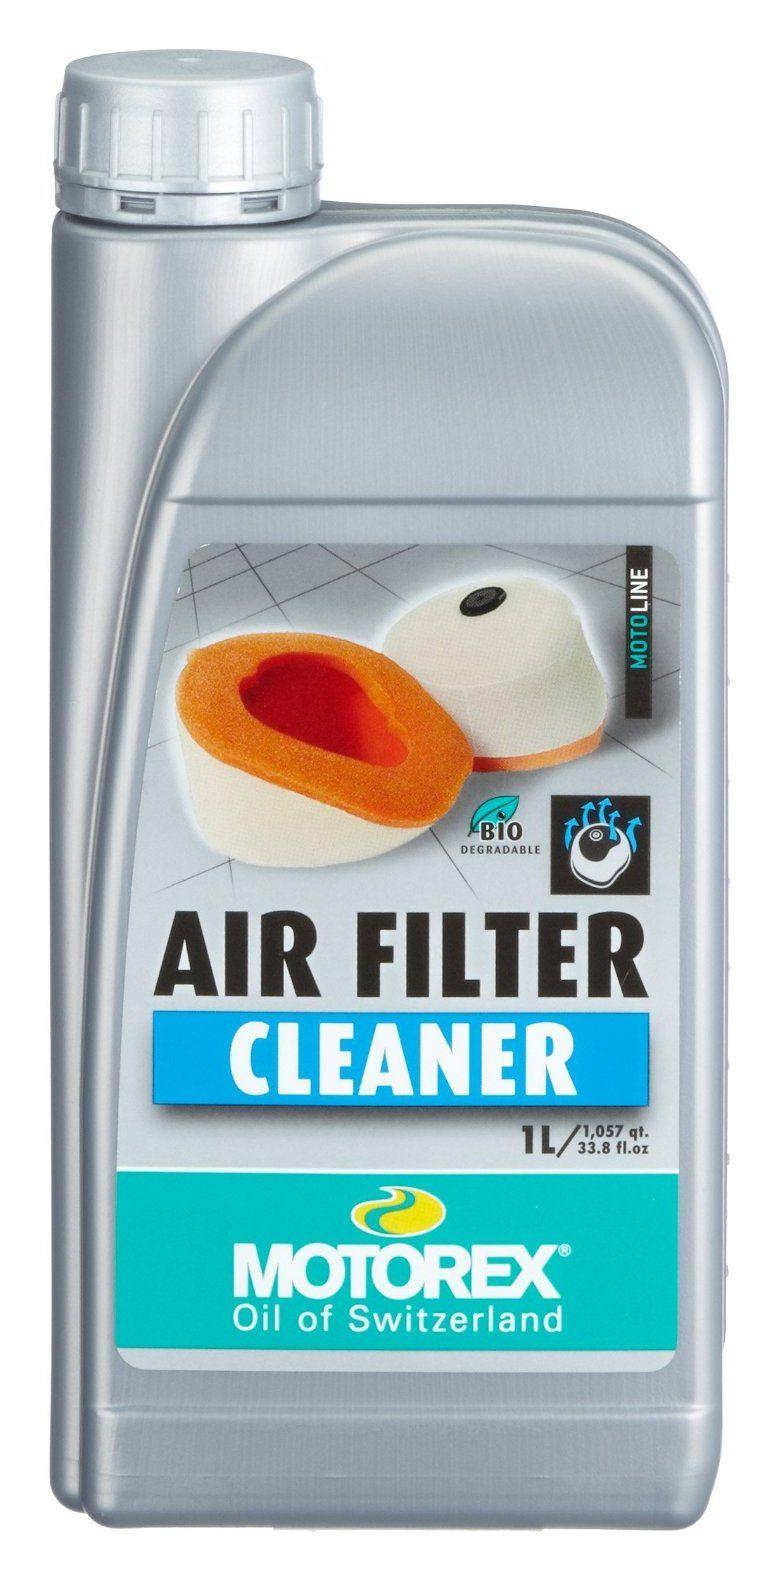 Foam Air Cleaner : Motorex foam air filter cleaner off revzilla